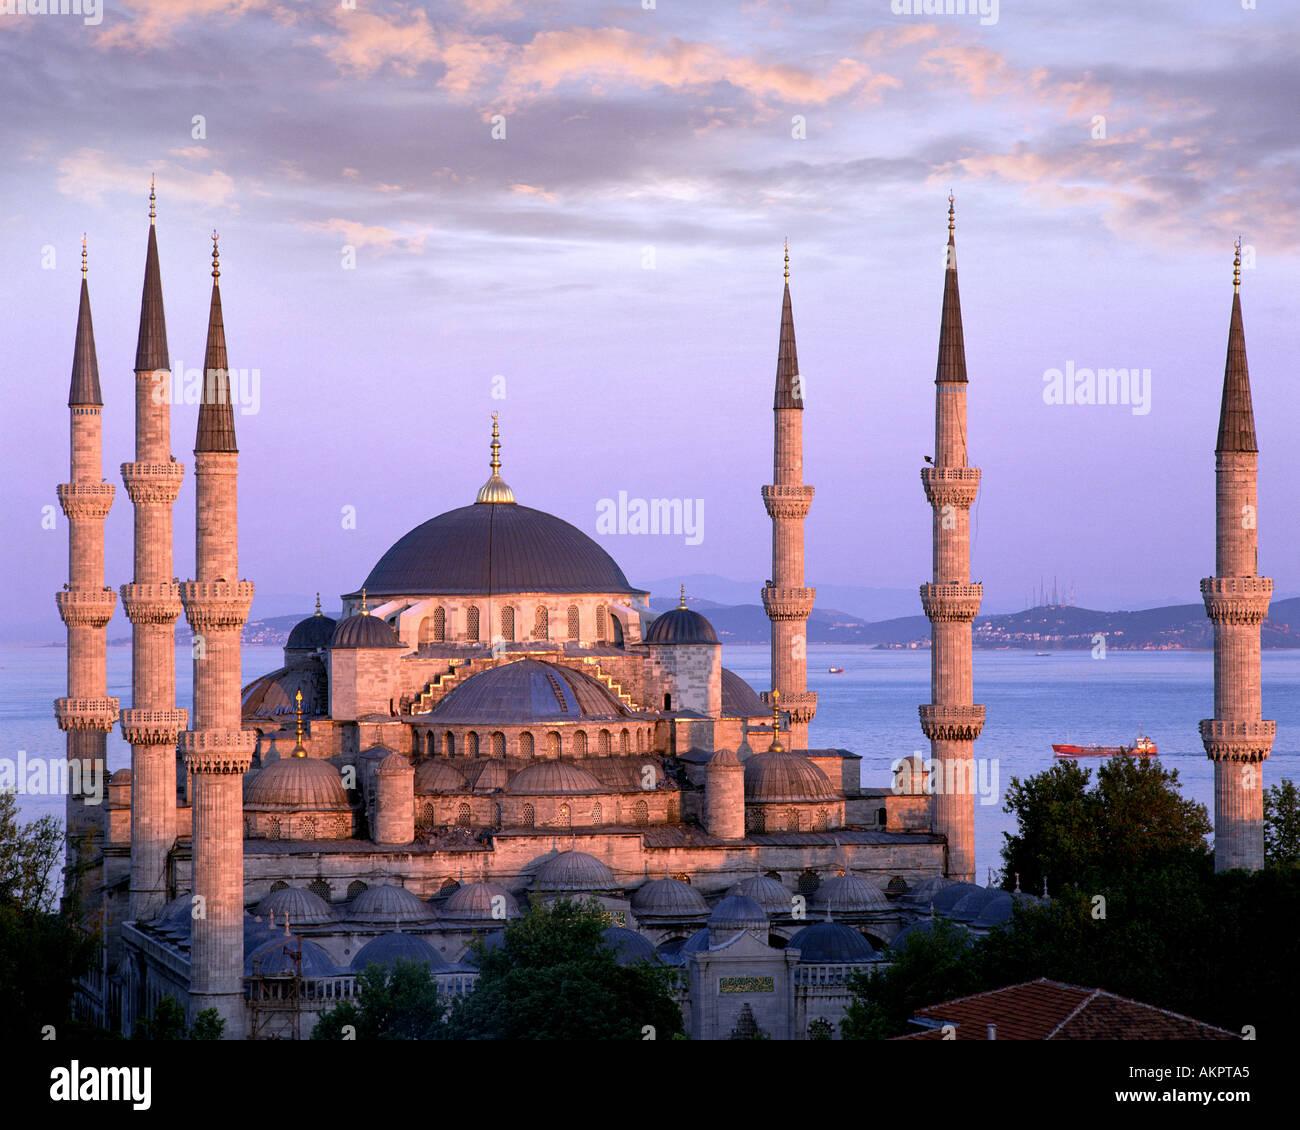 TY - Istanbul: la Moschea Blu Immagini Stock